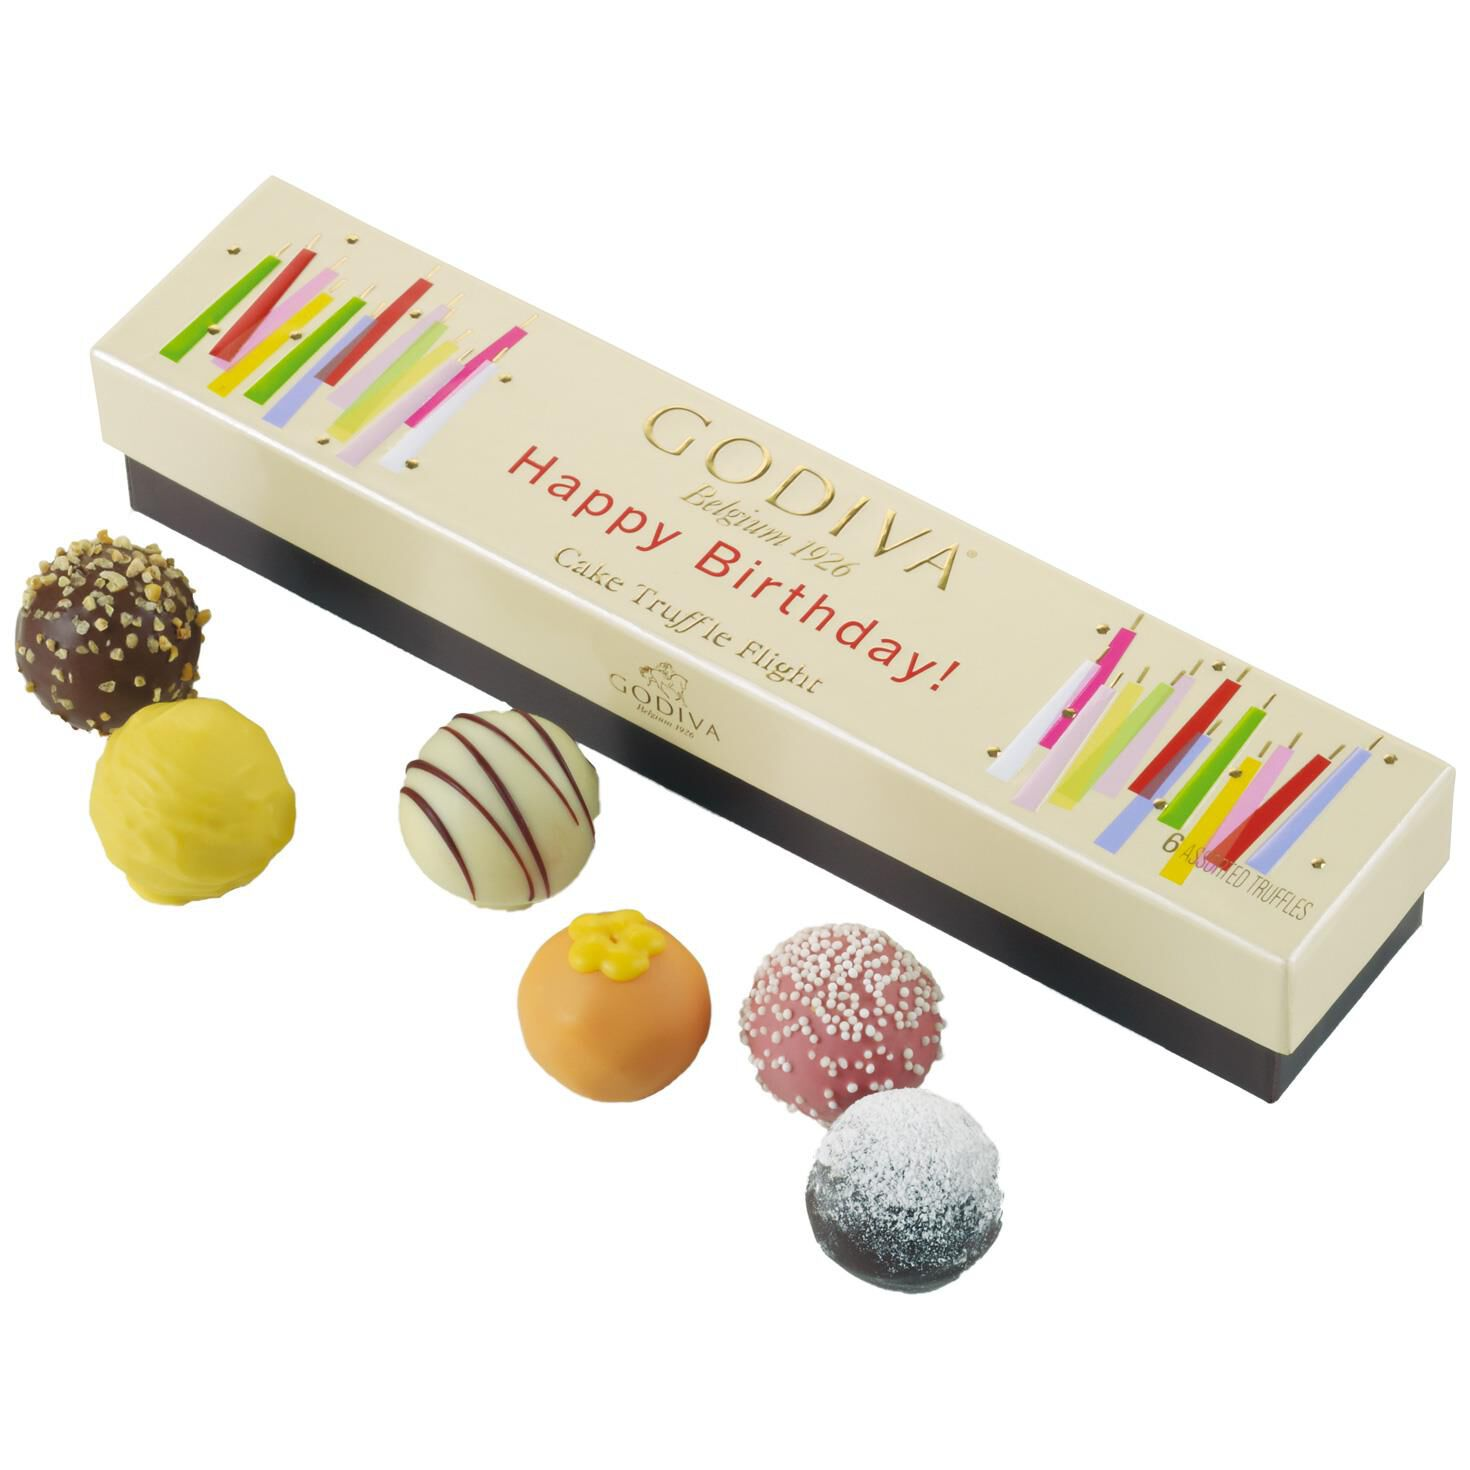 Godiva Chocolatier Happy Birthday Cake Truffle Flight In Box 6